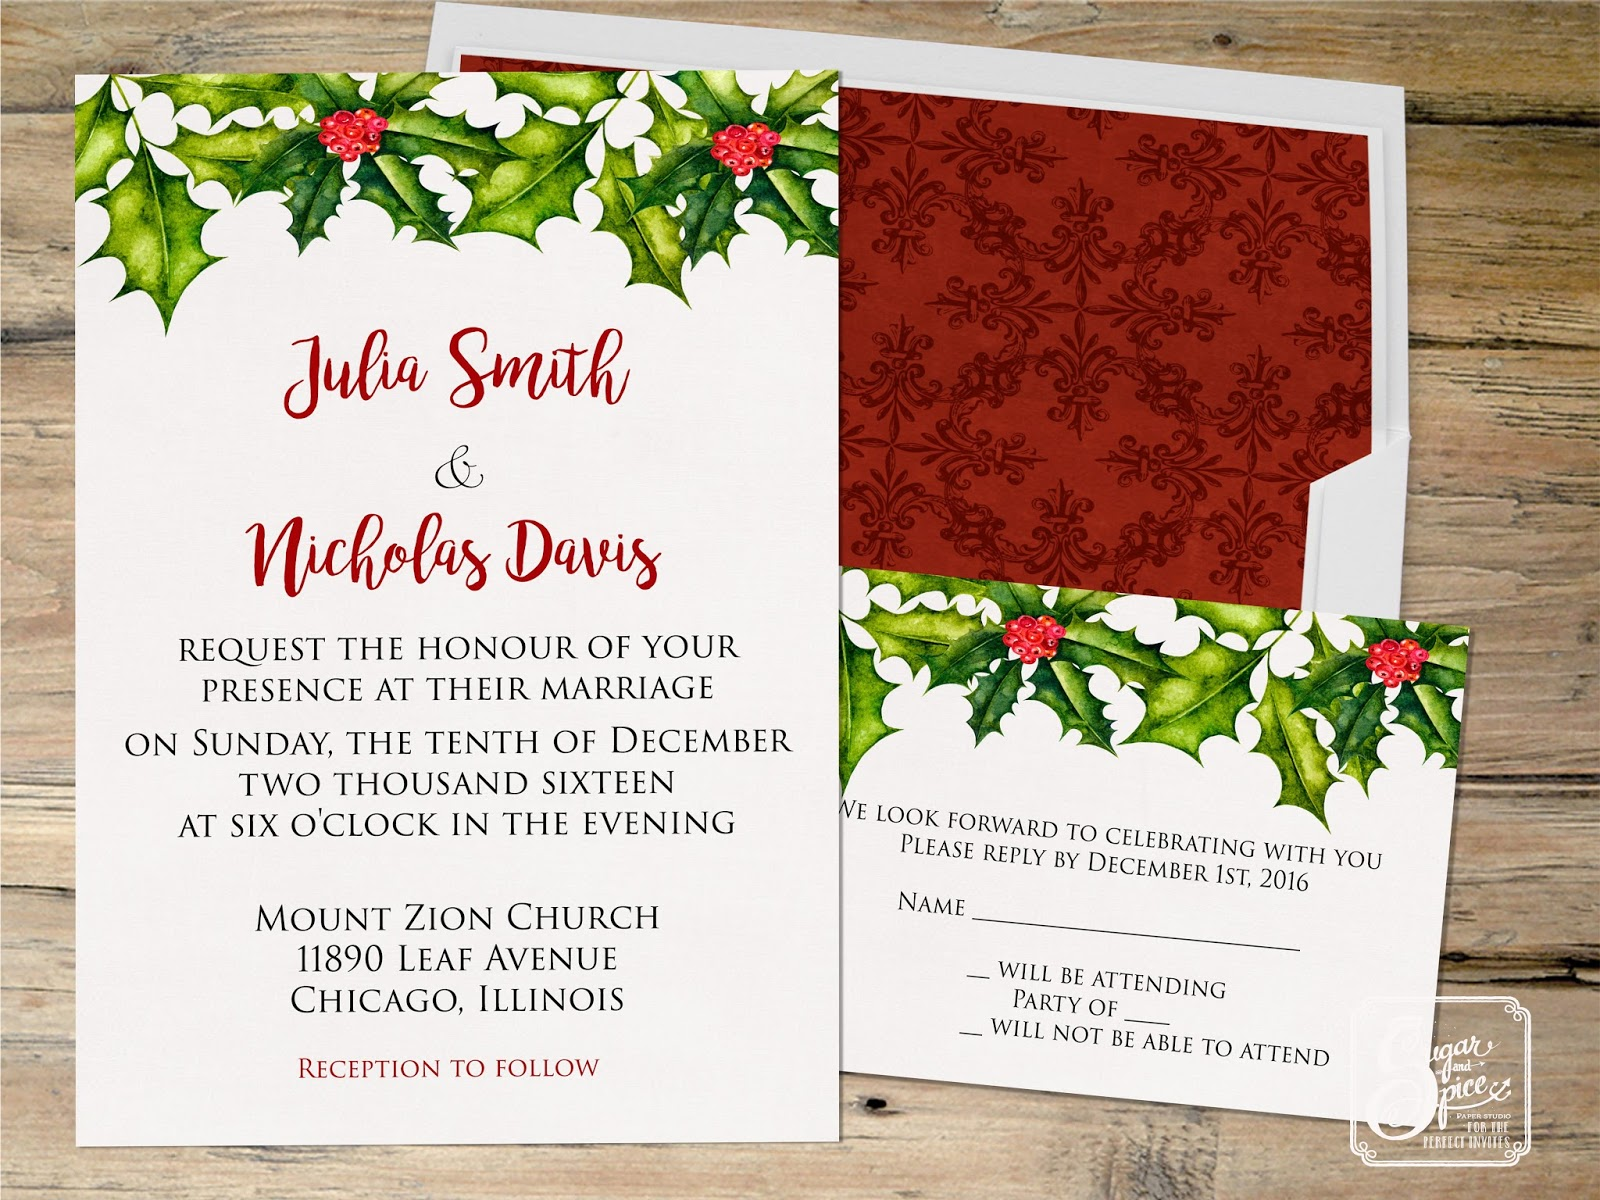 Modern Wedding Evening Invitation Image - Invitations and ...